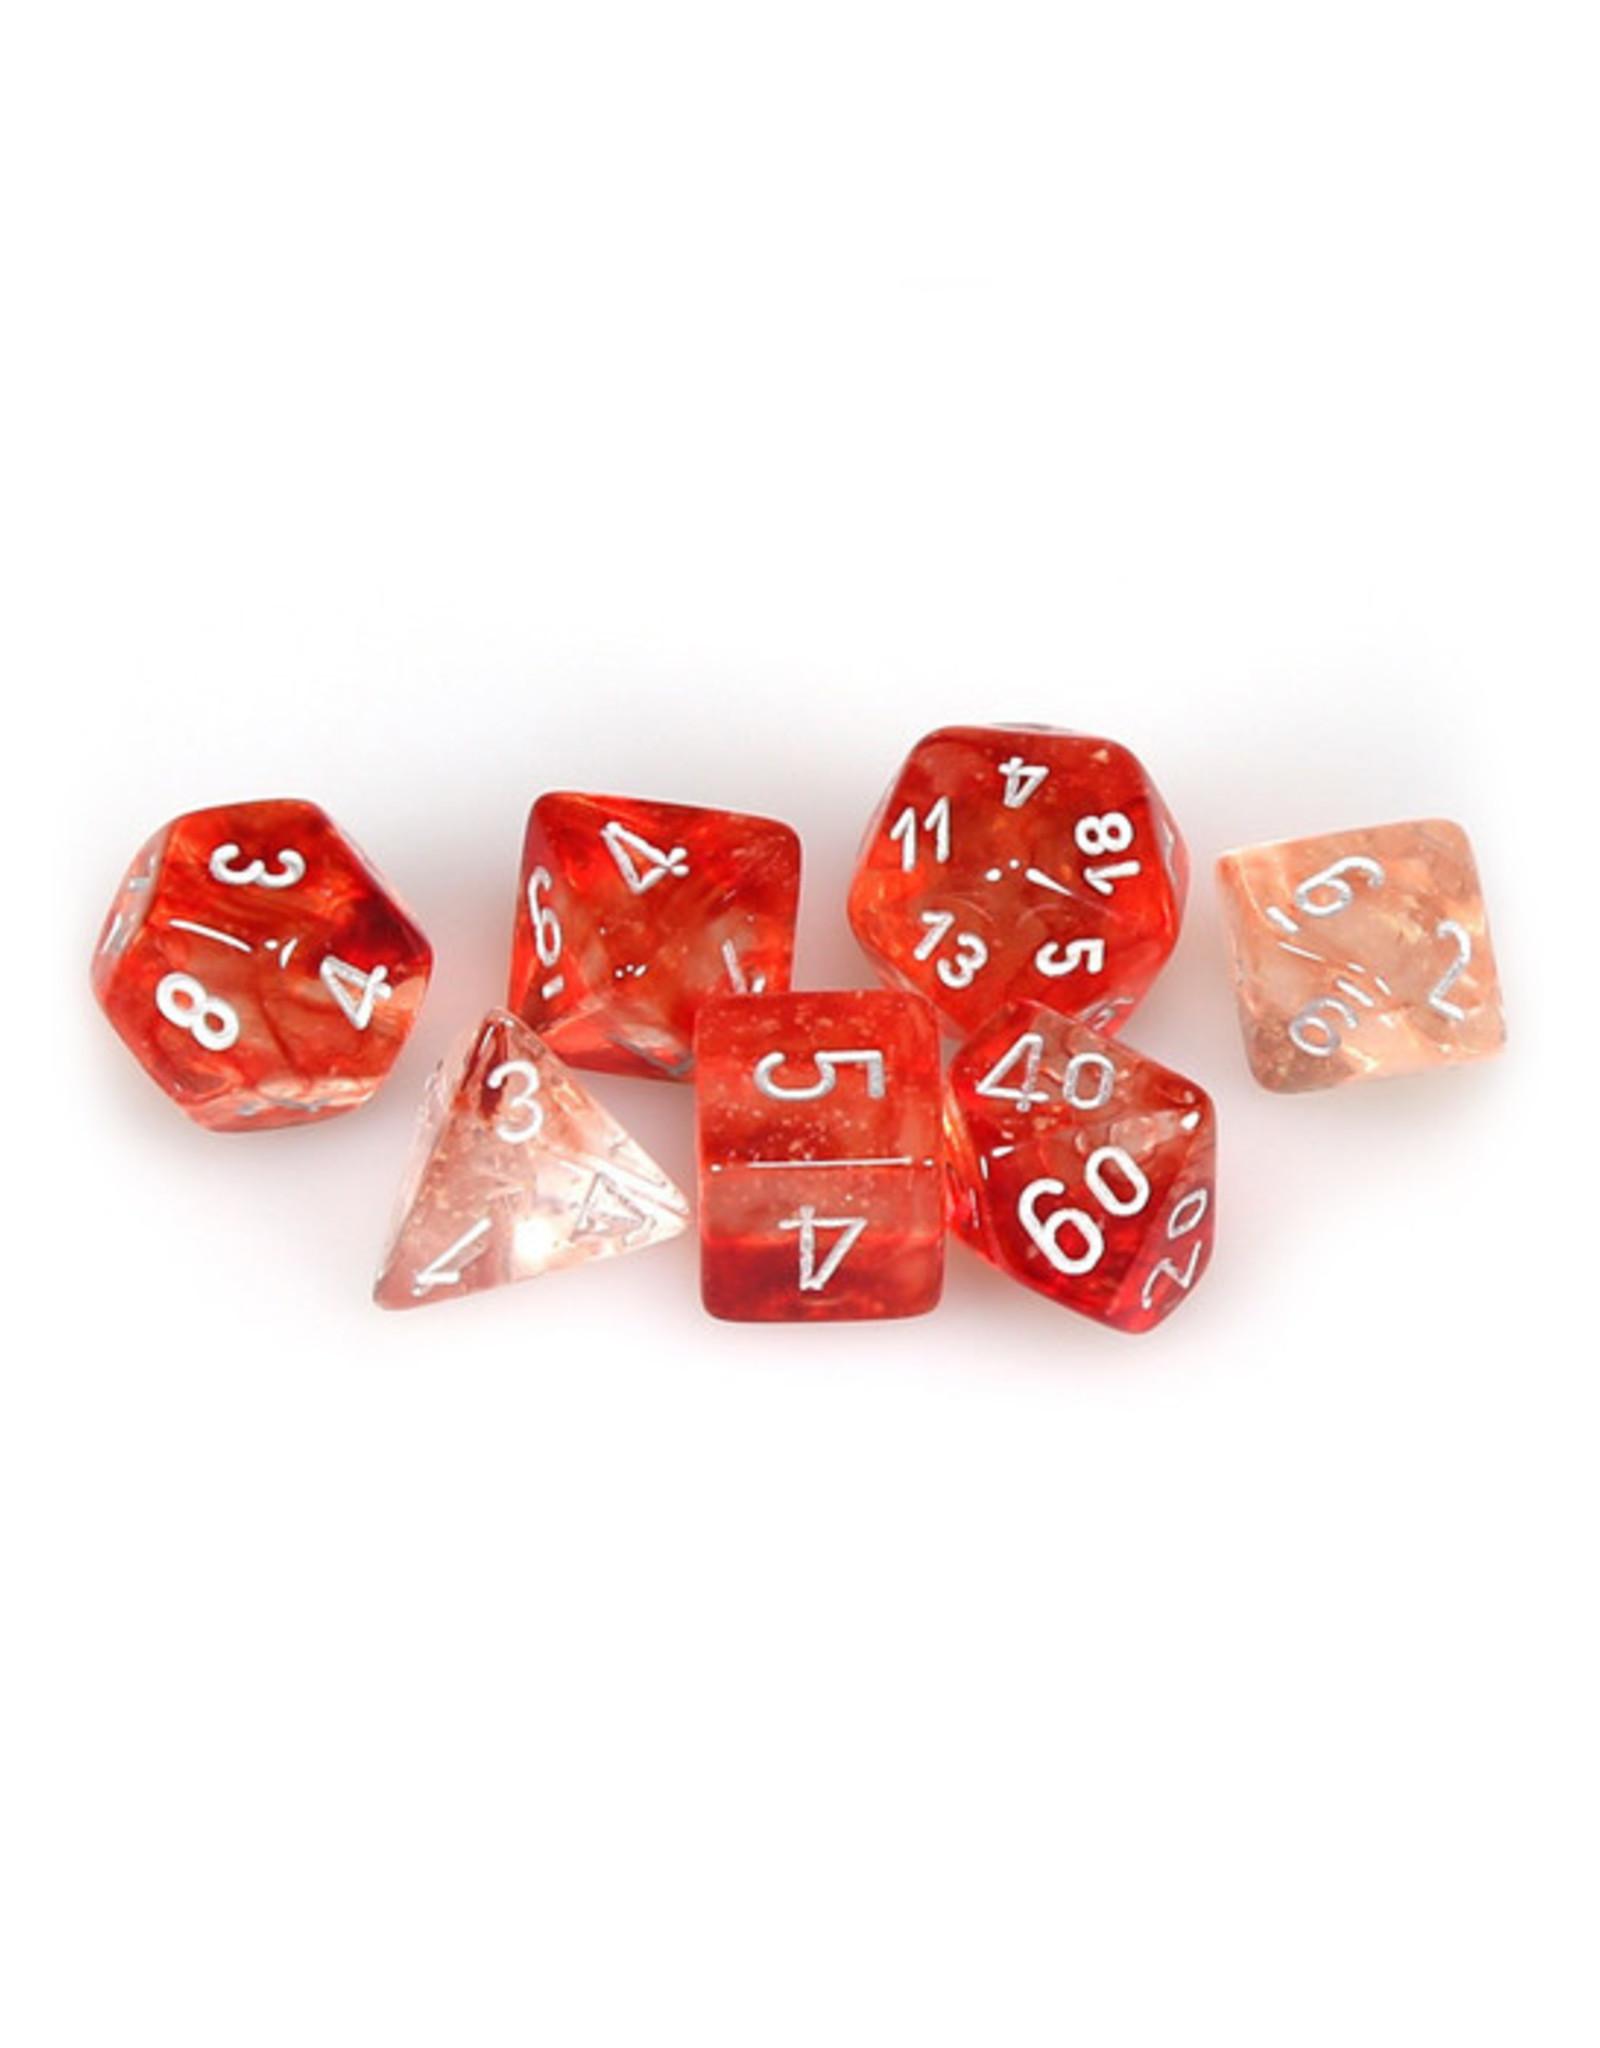 Chessex Chessex: Poly 7 Set - Nebula - Red w/ Silver